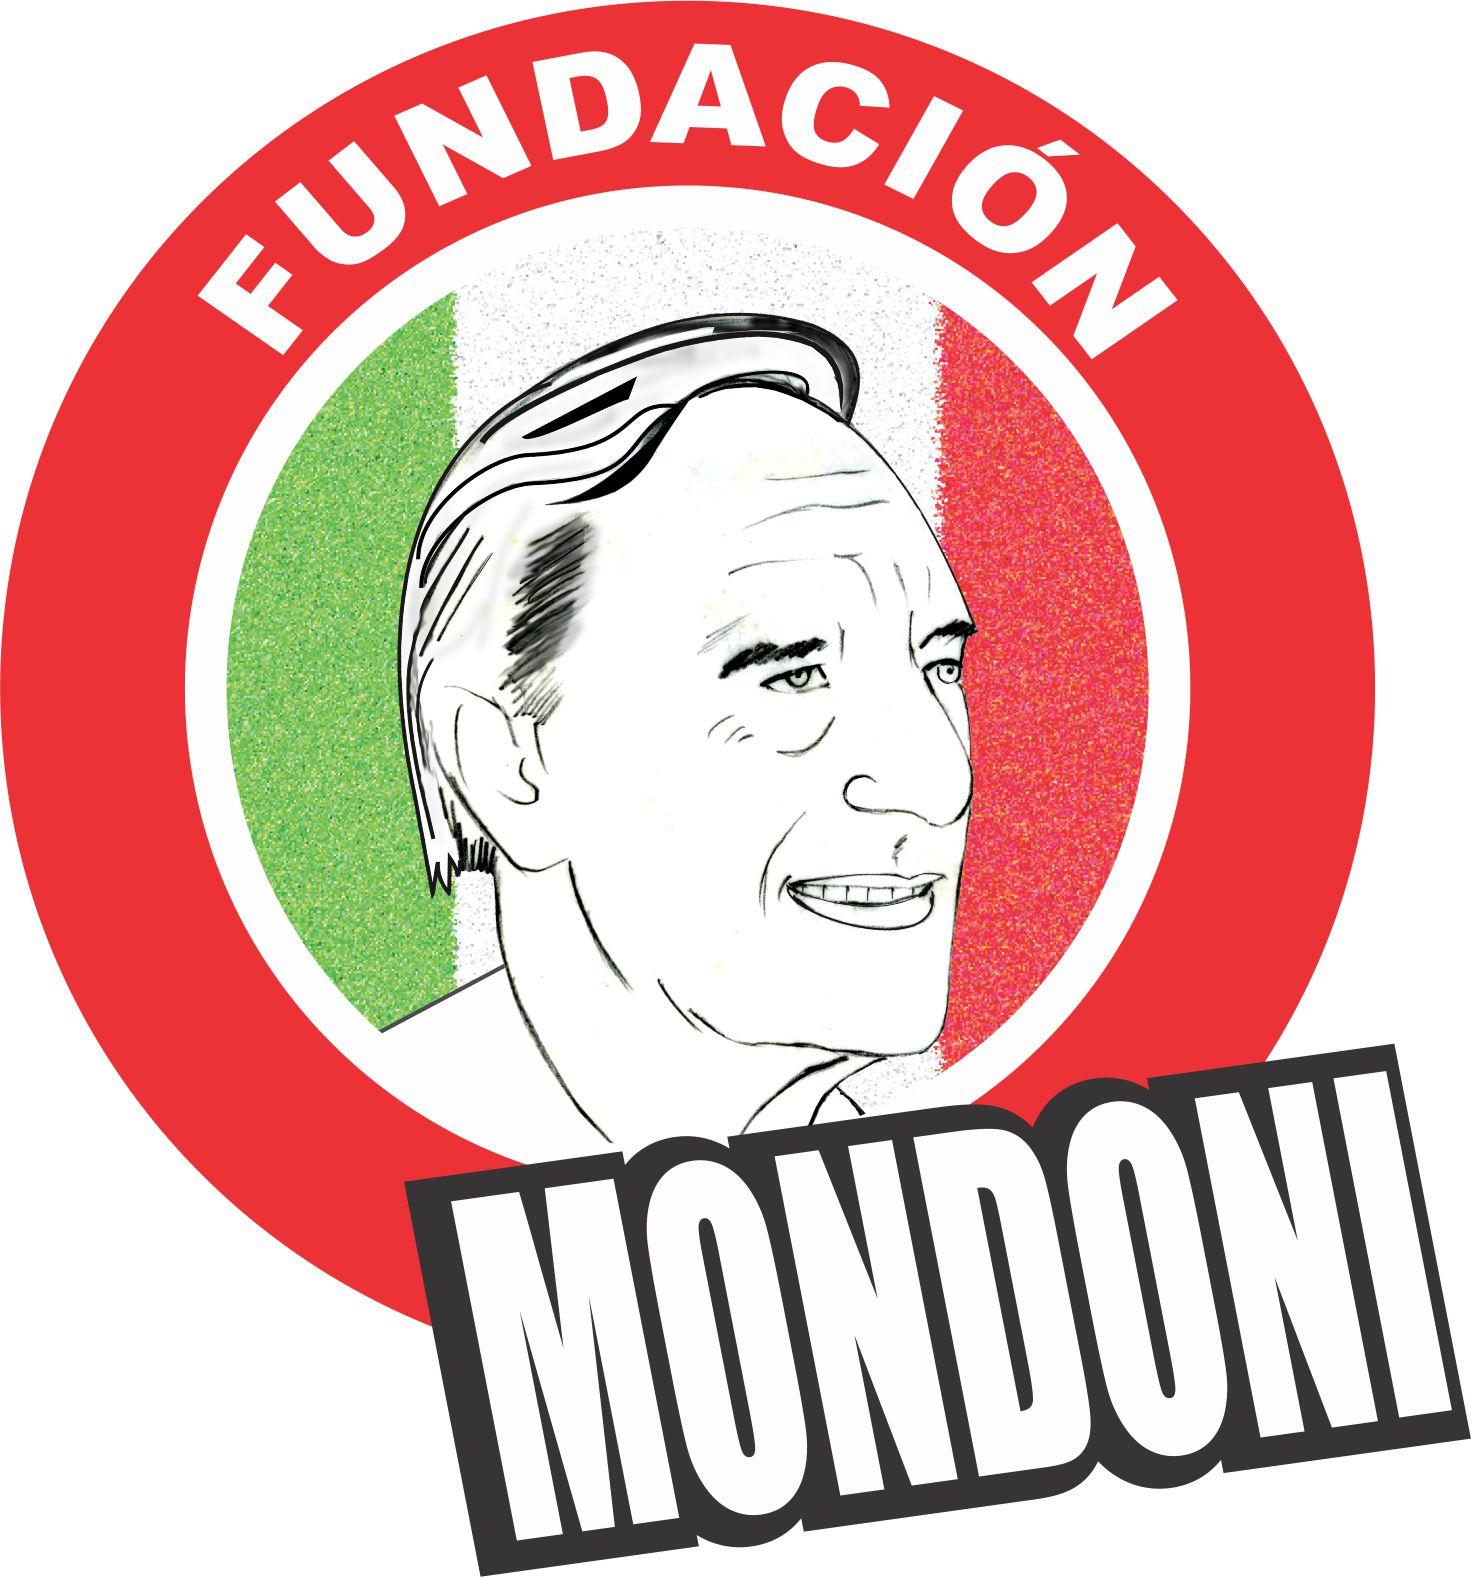 FUNDACION MONDONI 1